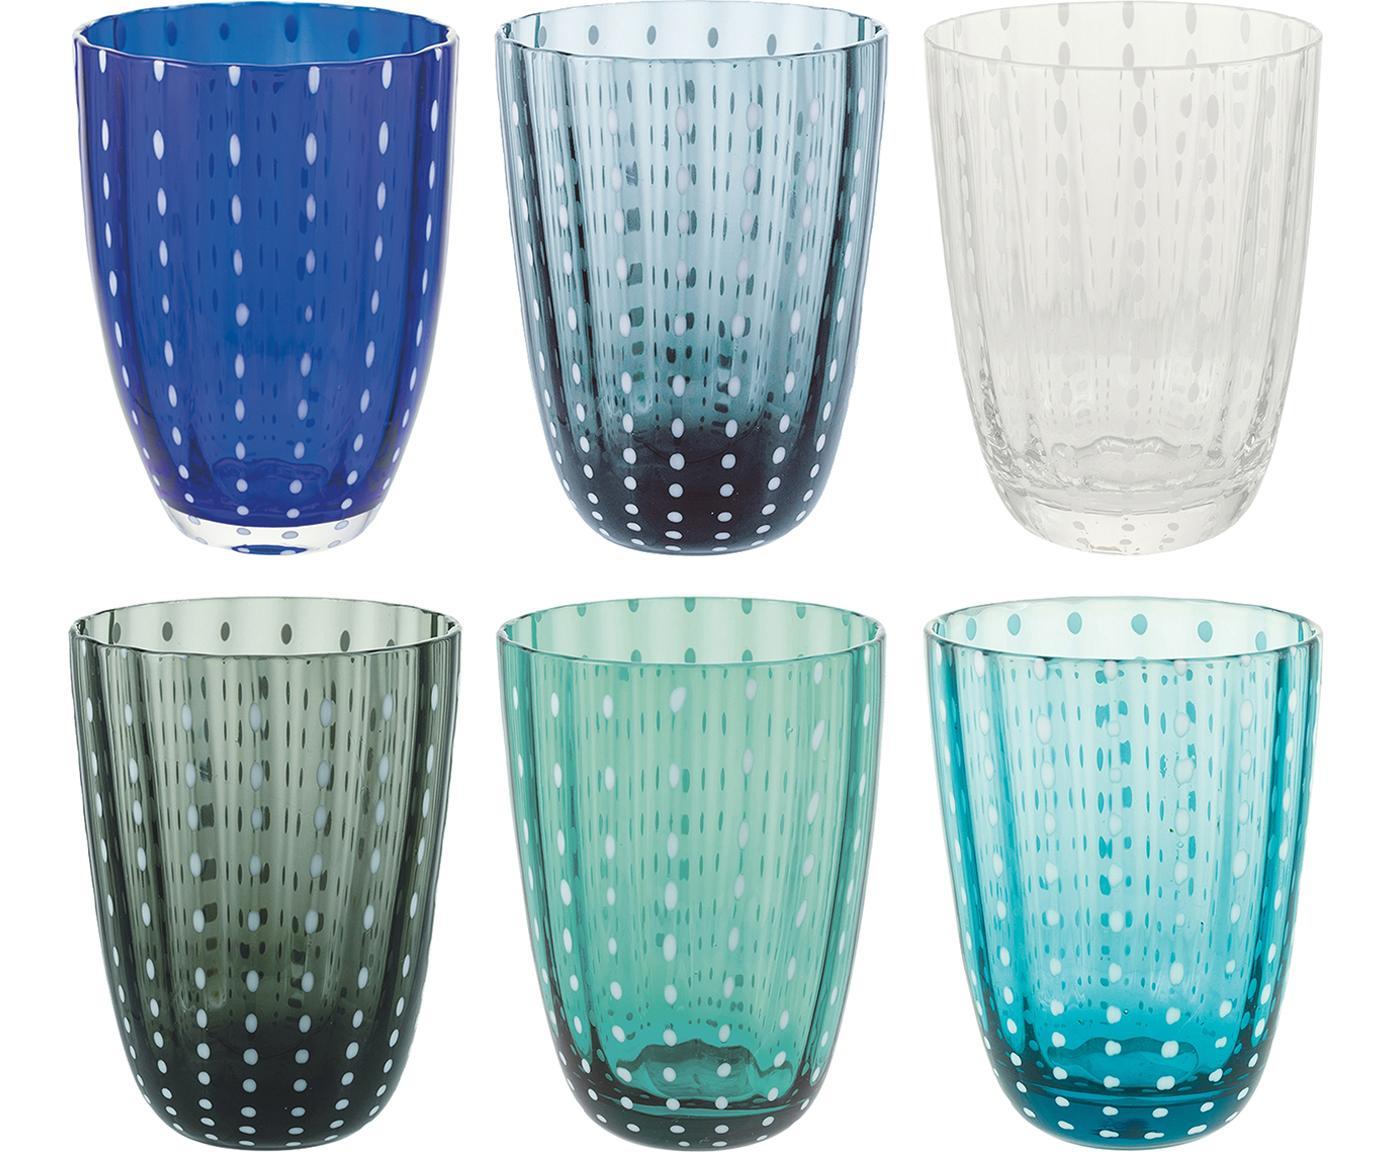 Waterglazenset Kalahari, 6-delig, Glas, Multicolour, Ø 9 x H 11 cm